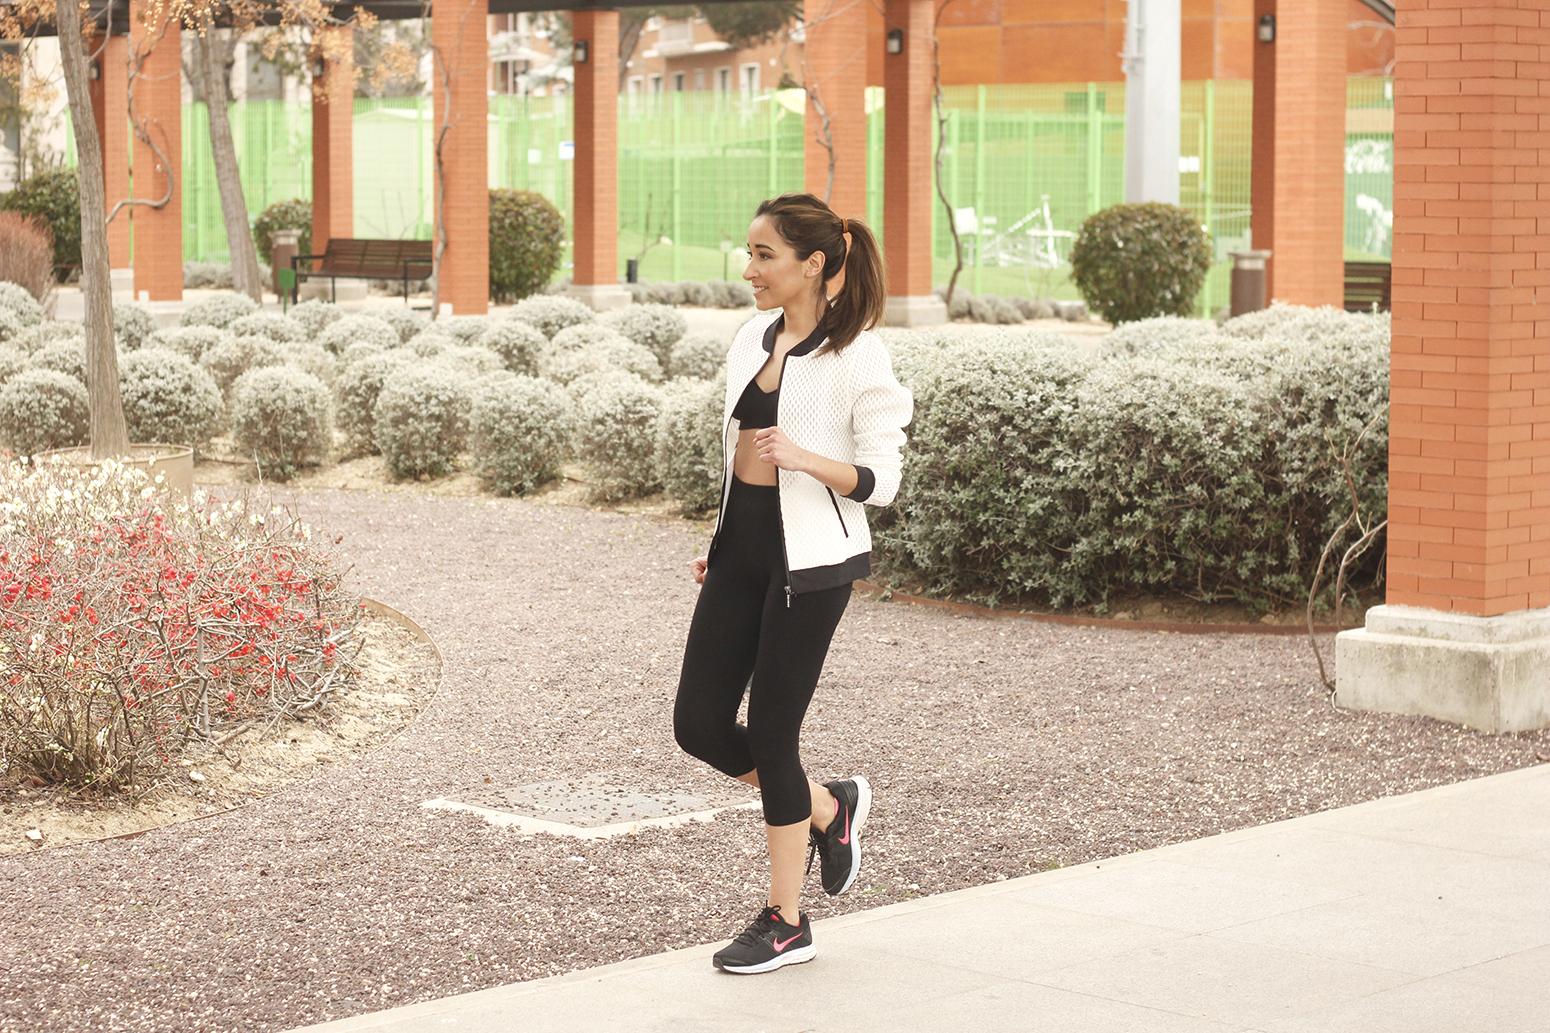 Doutzen Sport Collection white jacket leggings sneakers nike lifestyle health running correr deporte08